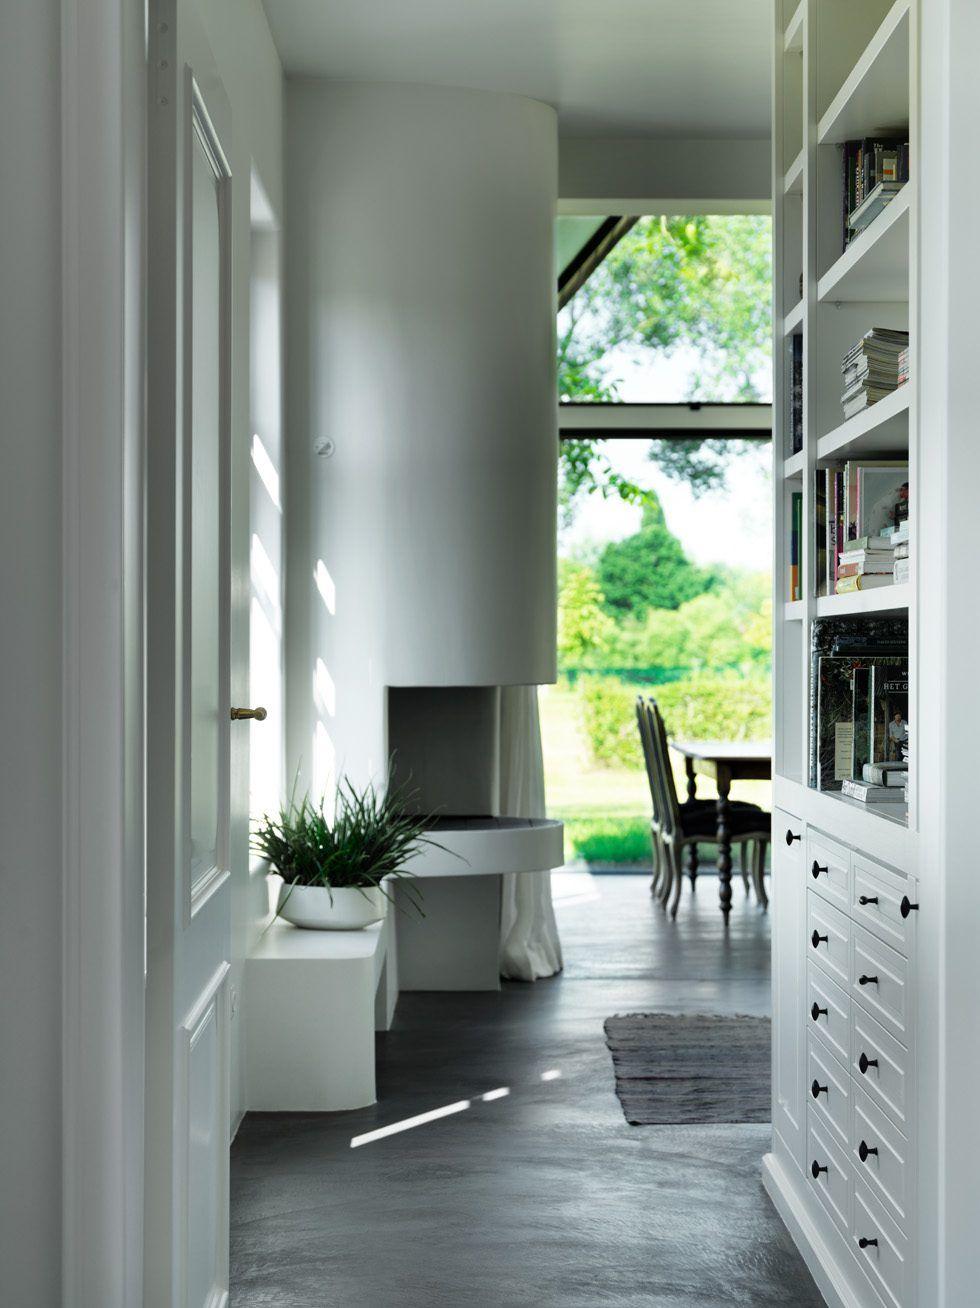 Minimalist House 85 Design: Interior Design